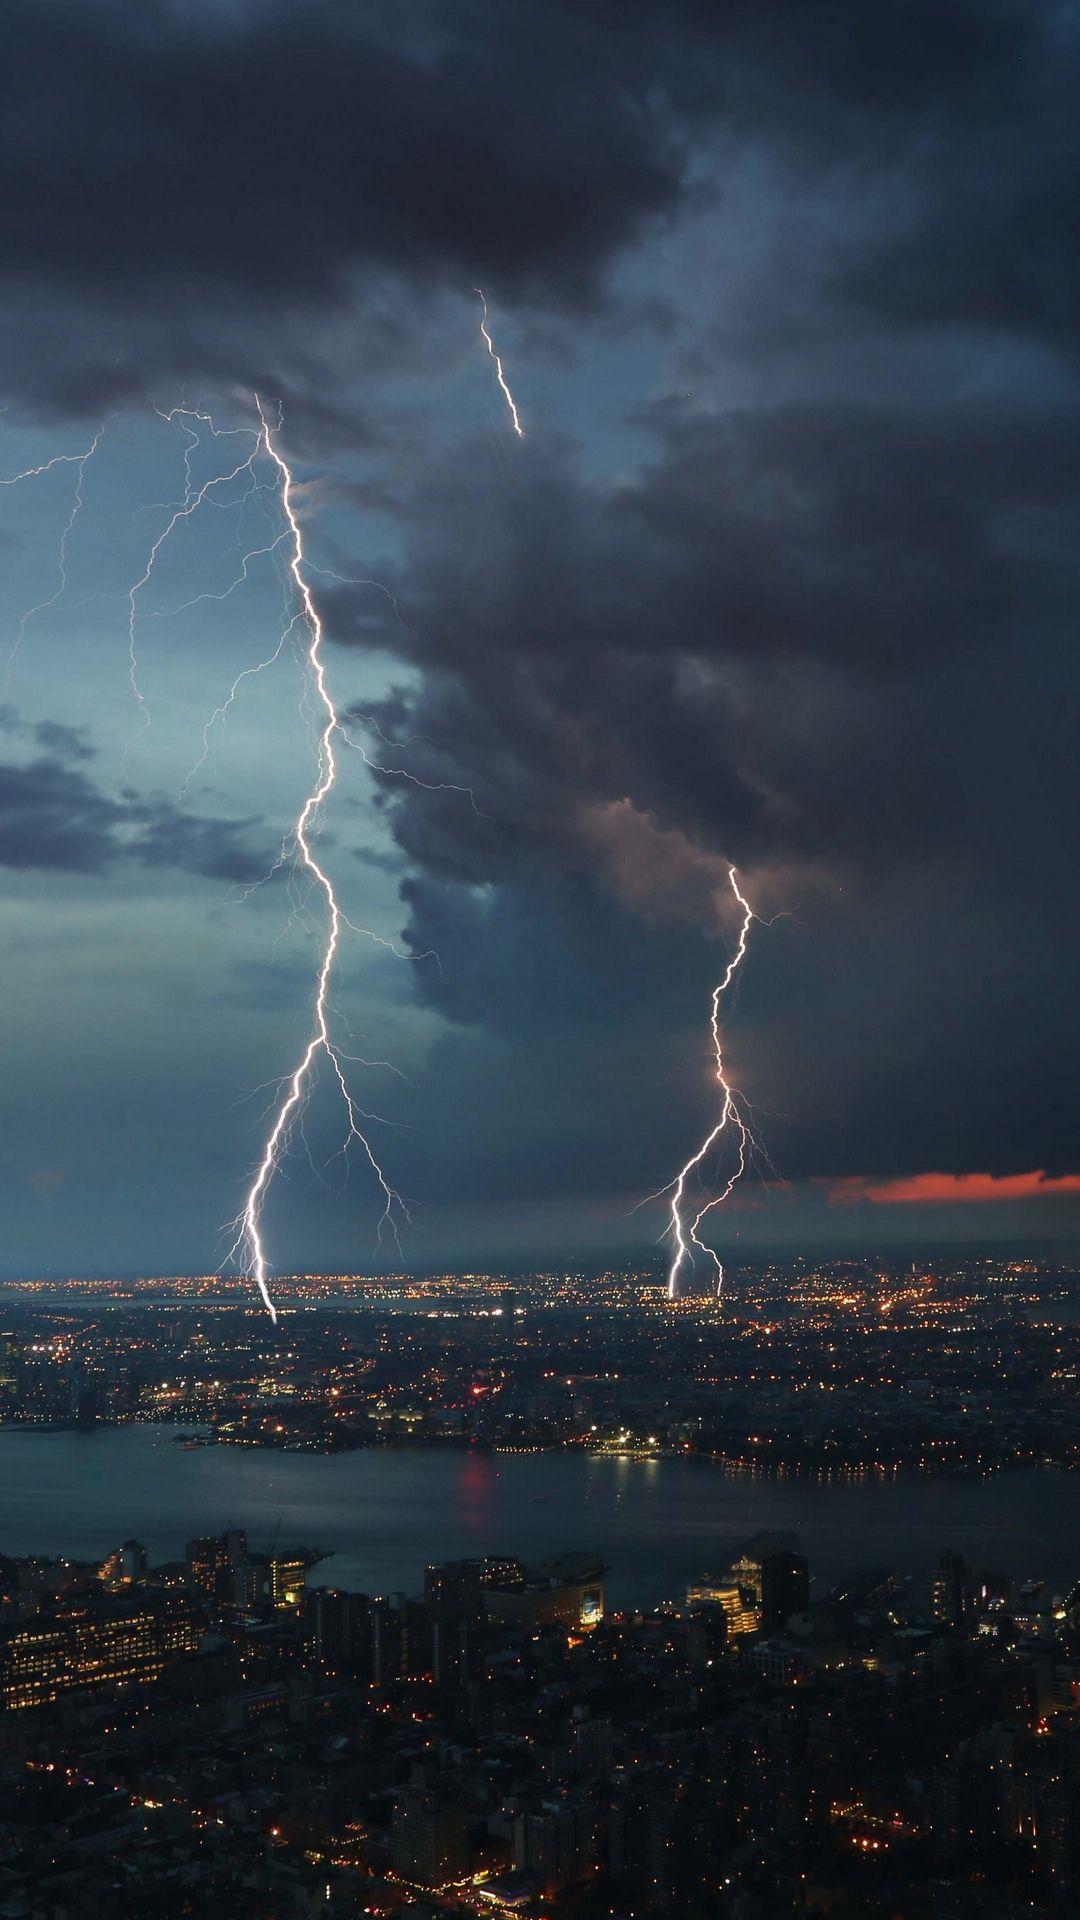 1080x1920 Wallpaper Thunderstorm City Sky Overcast Storm Wallpaper 4k Background Rain Wallpapers